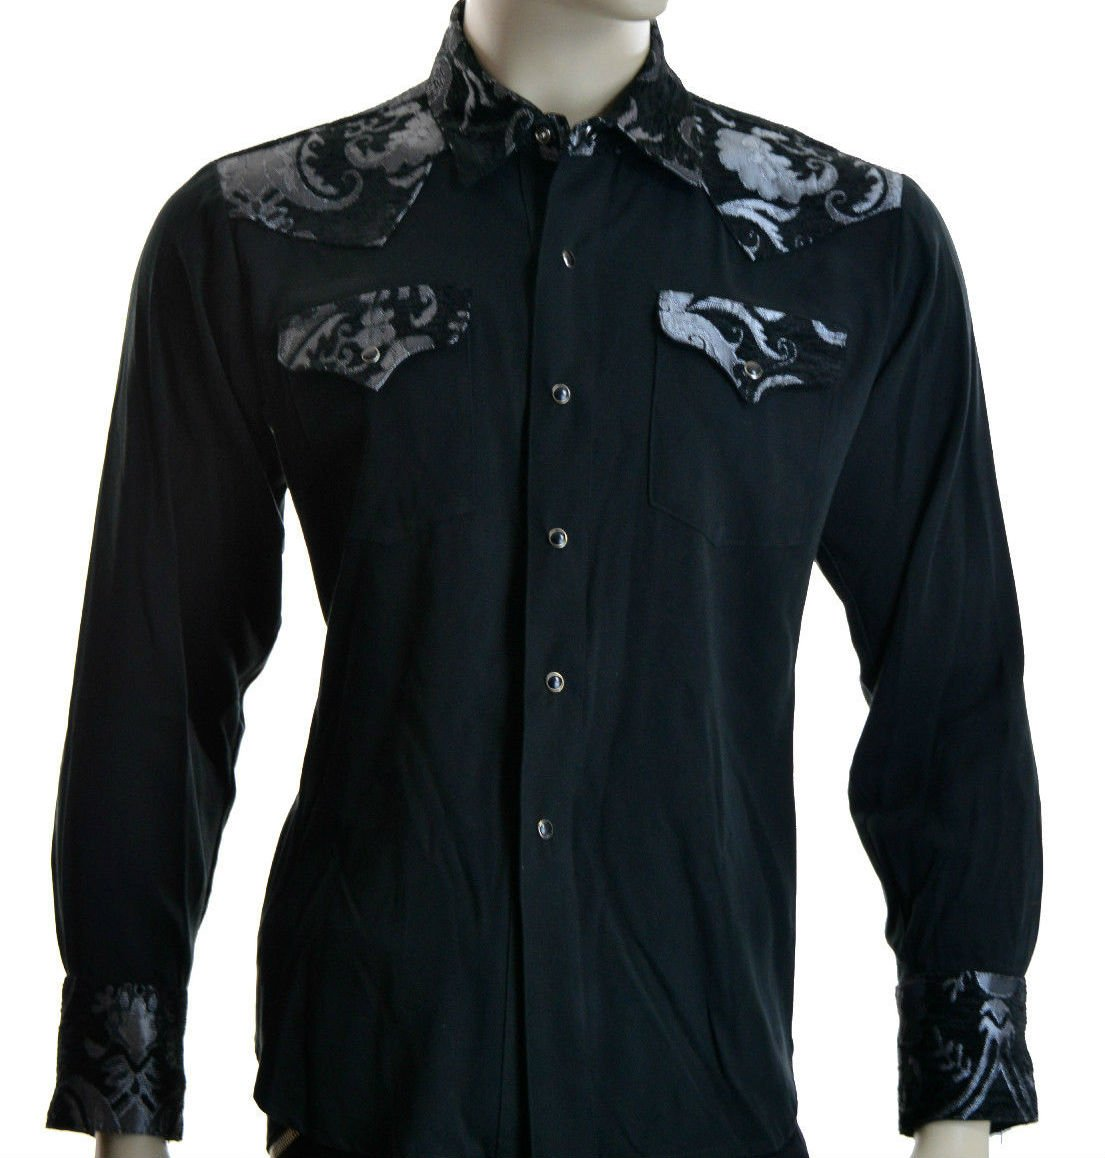 Shrine Rocker Steampunk Cowboy Rodeo Western Wild West Black Silver Tapestry Shirt (L)